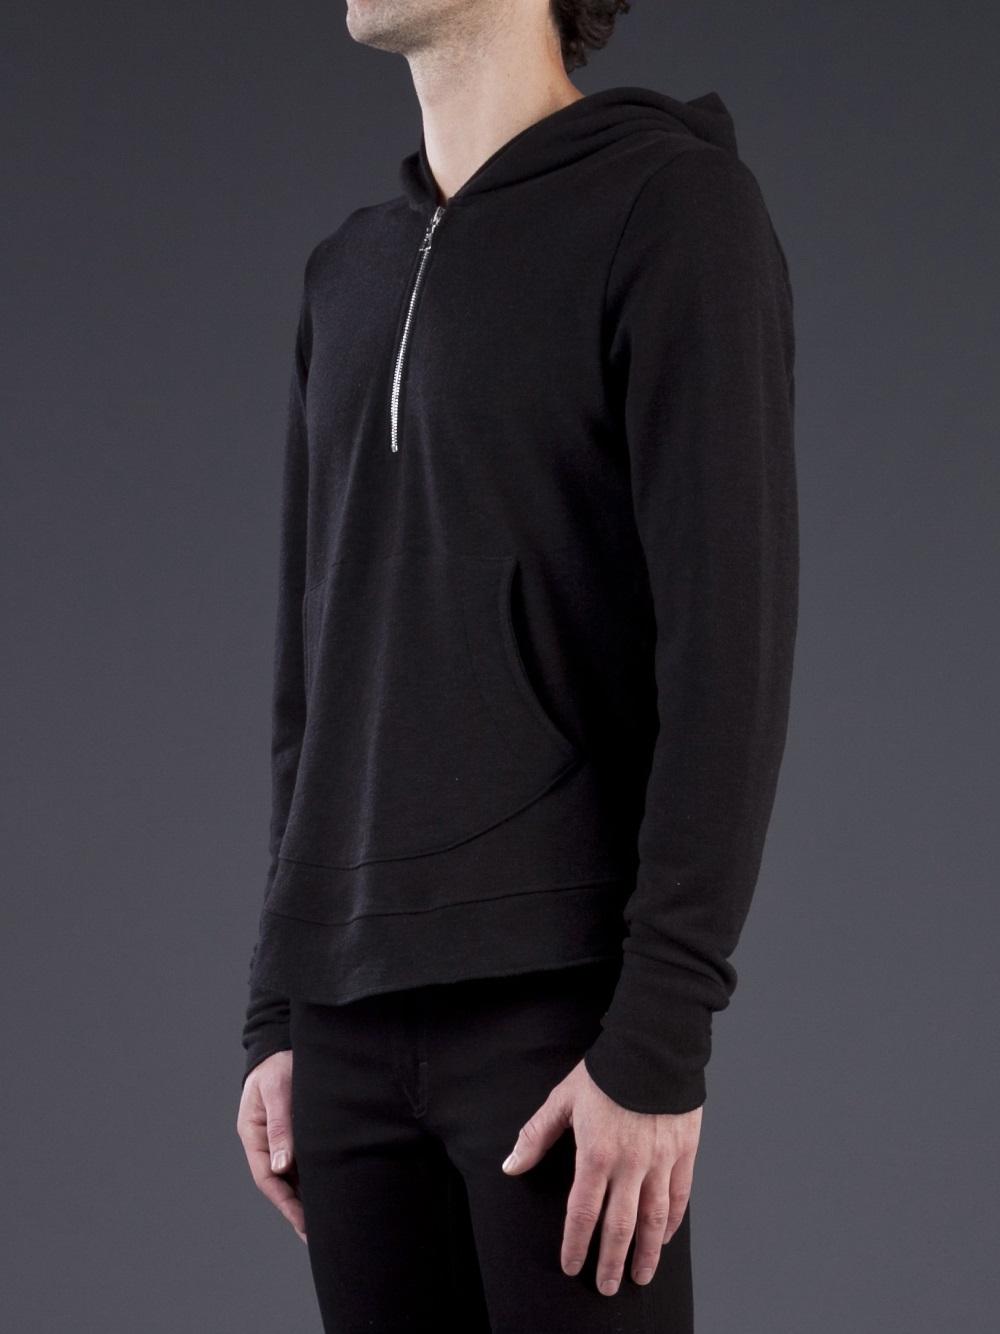 John elliott Riga Half Zip Hoodie in Black for Men | Lyst